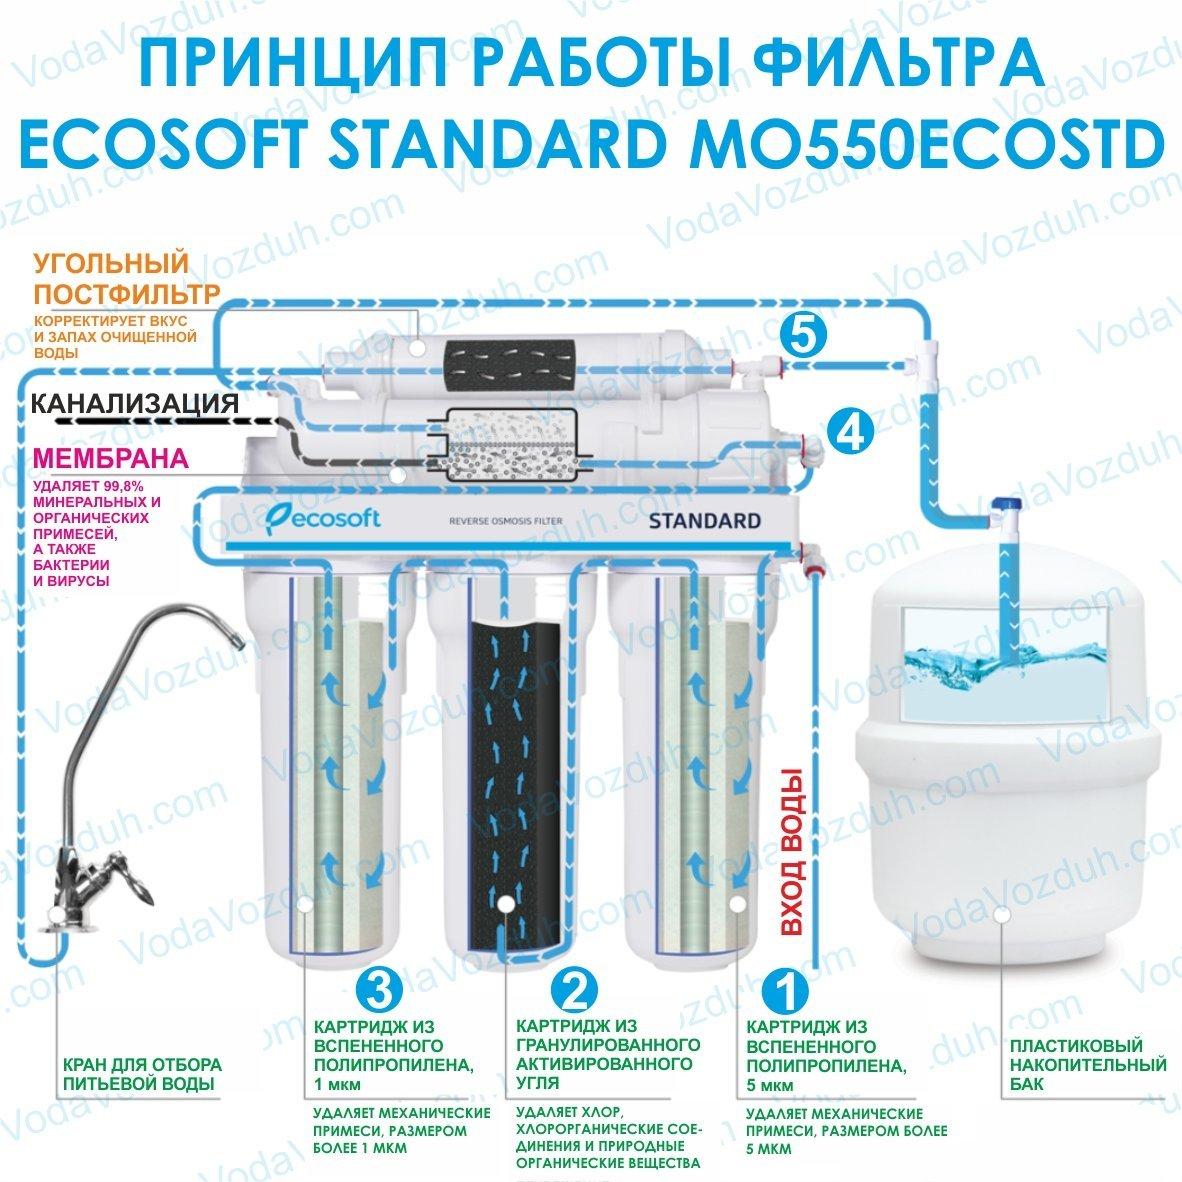 Ecosoft Standard5-50 MO550ECOSTD VodaVozduh